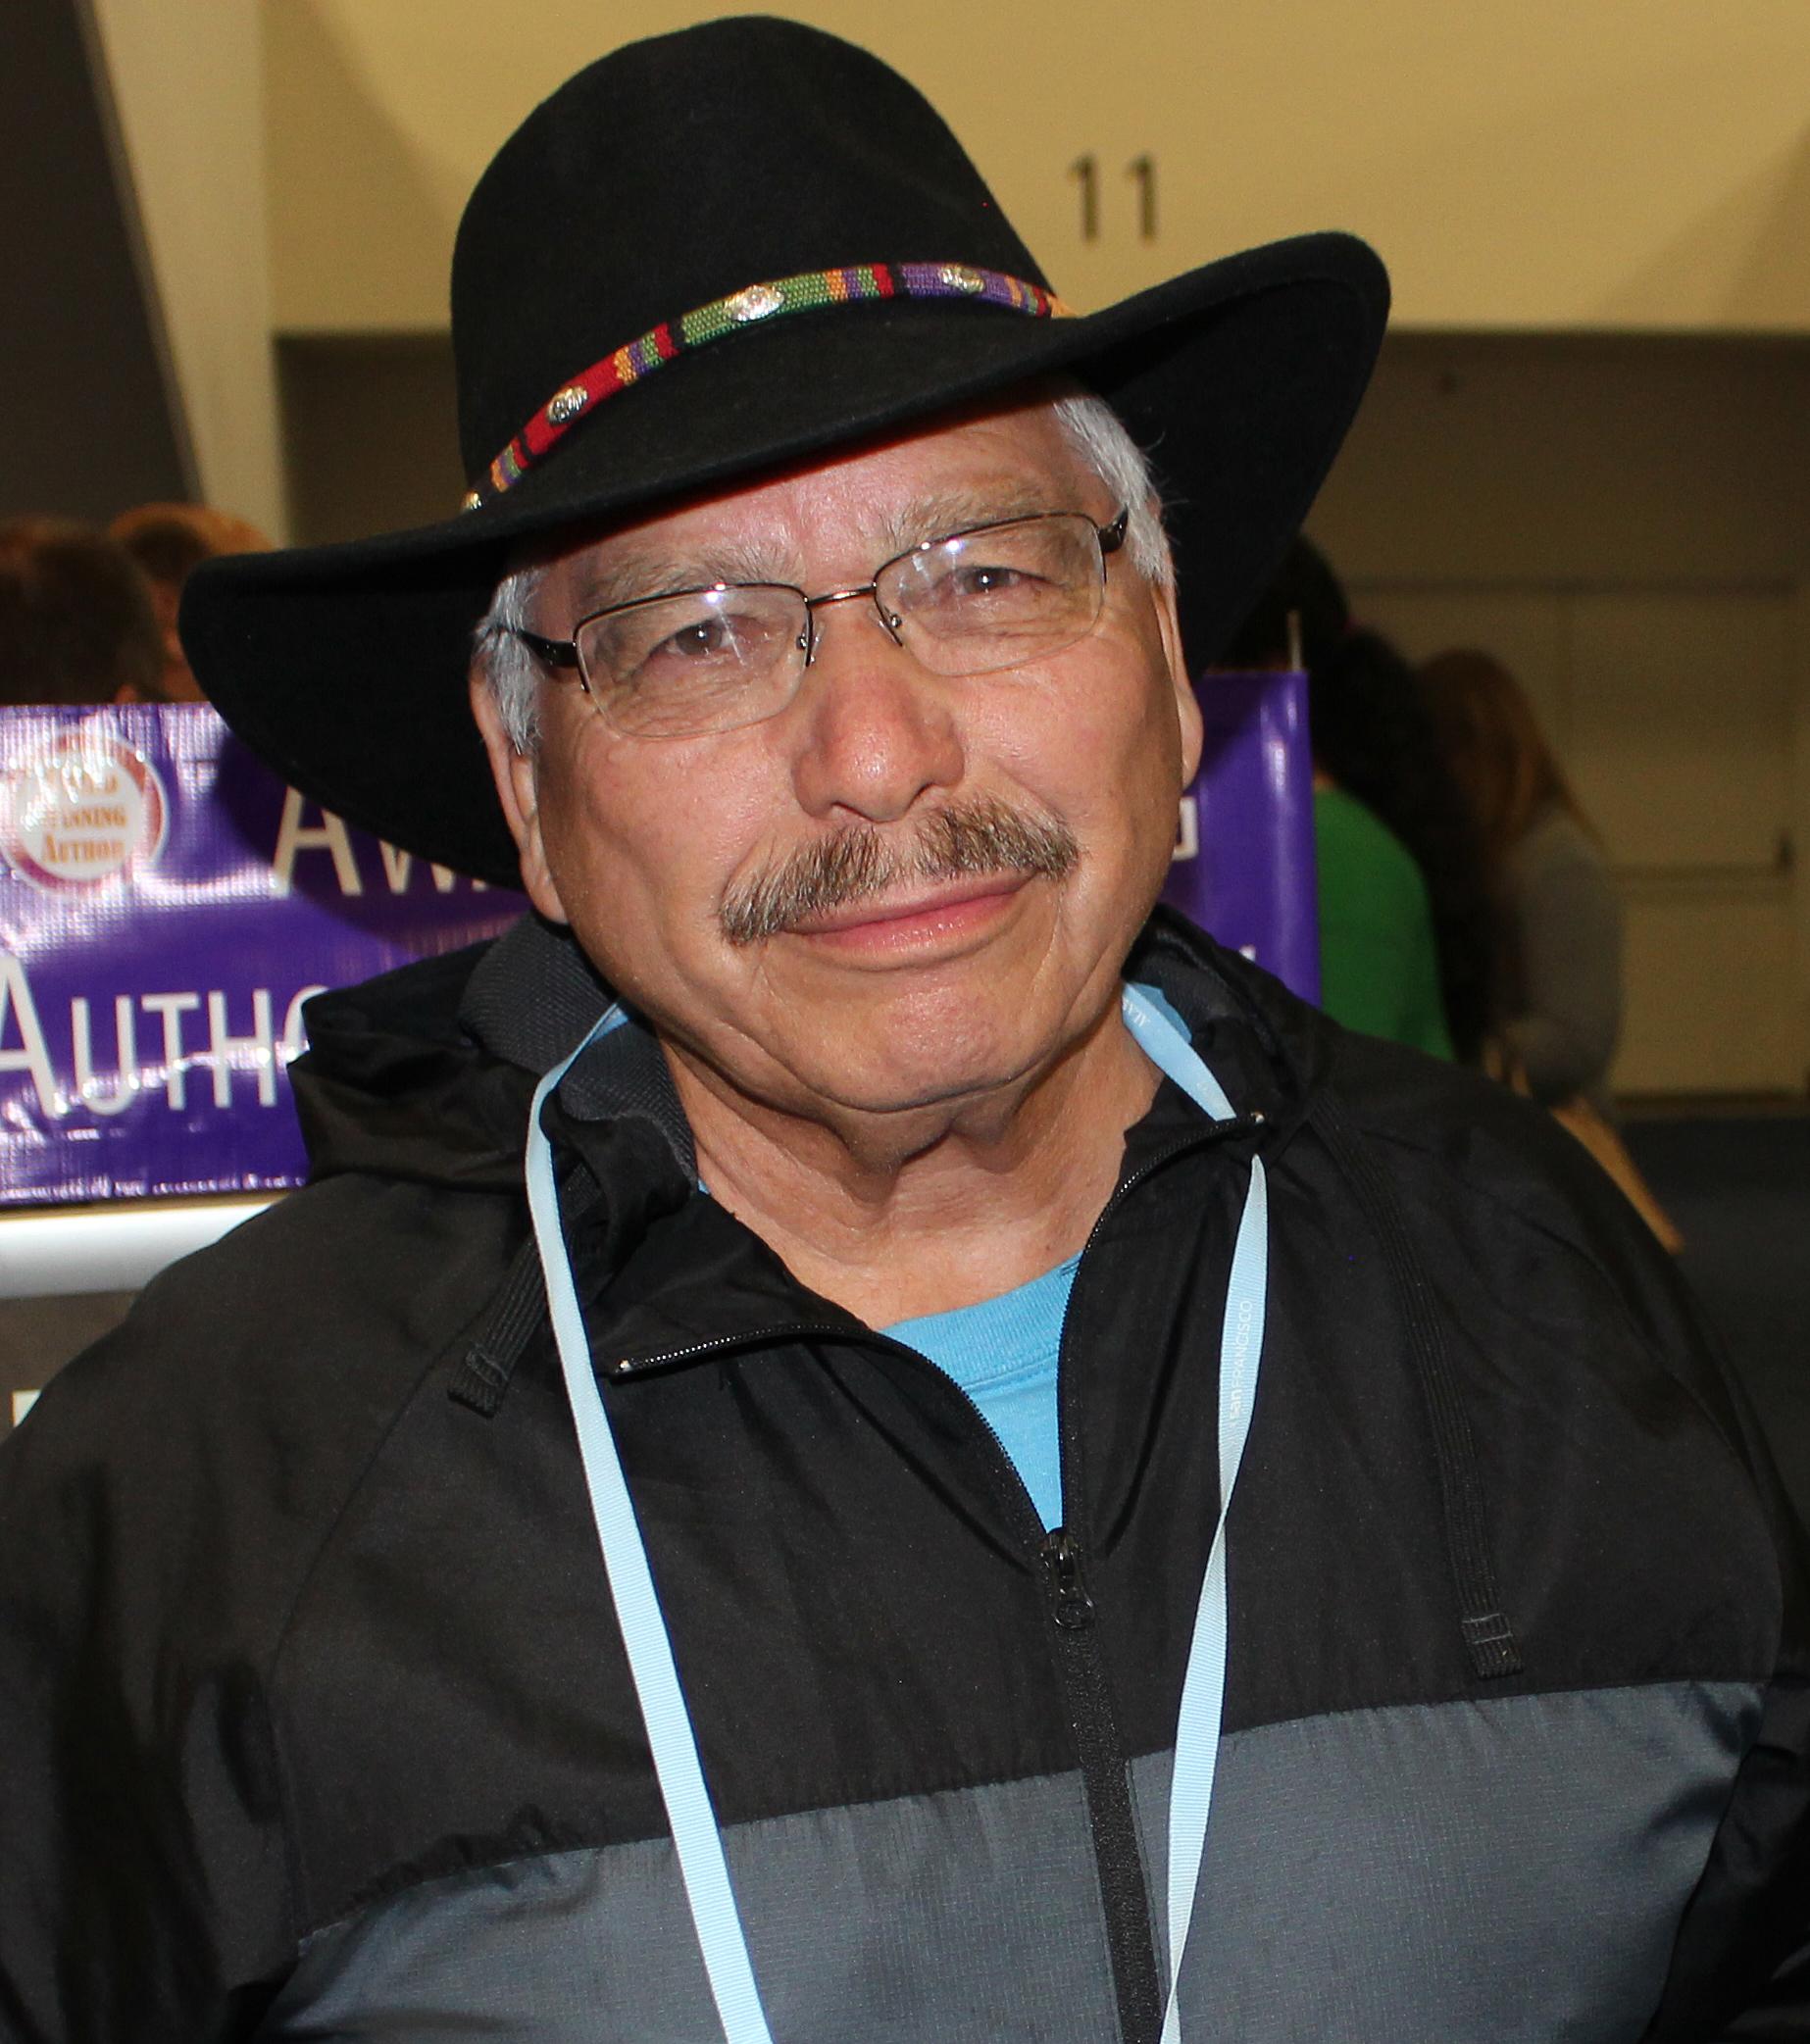 Villaseñor in 2015